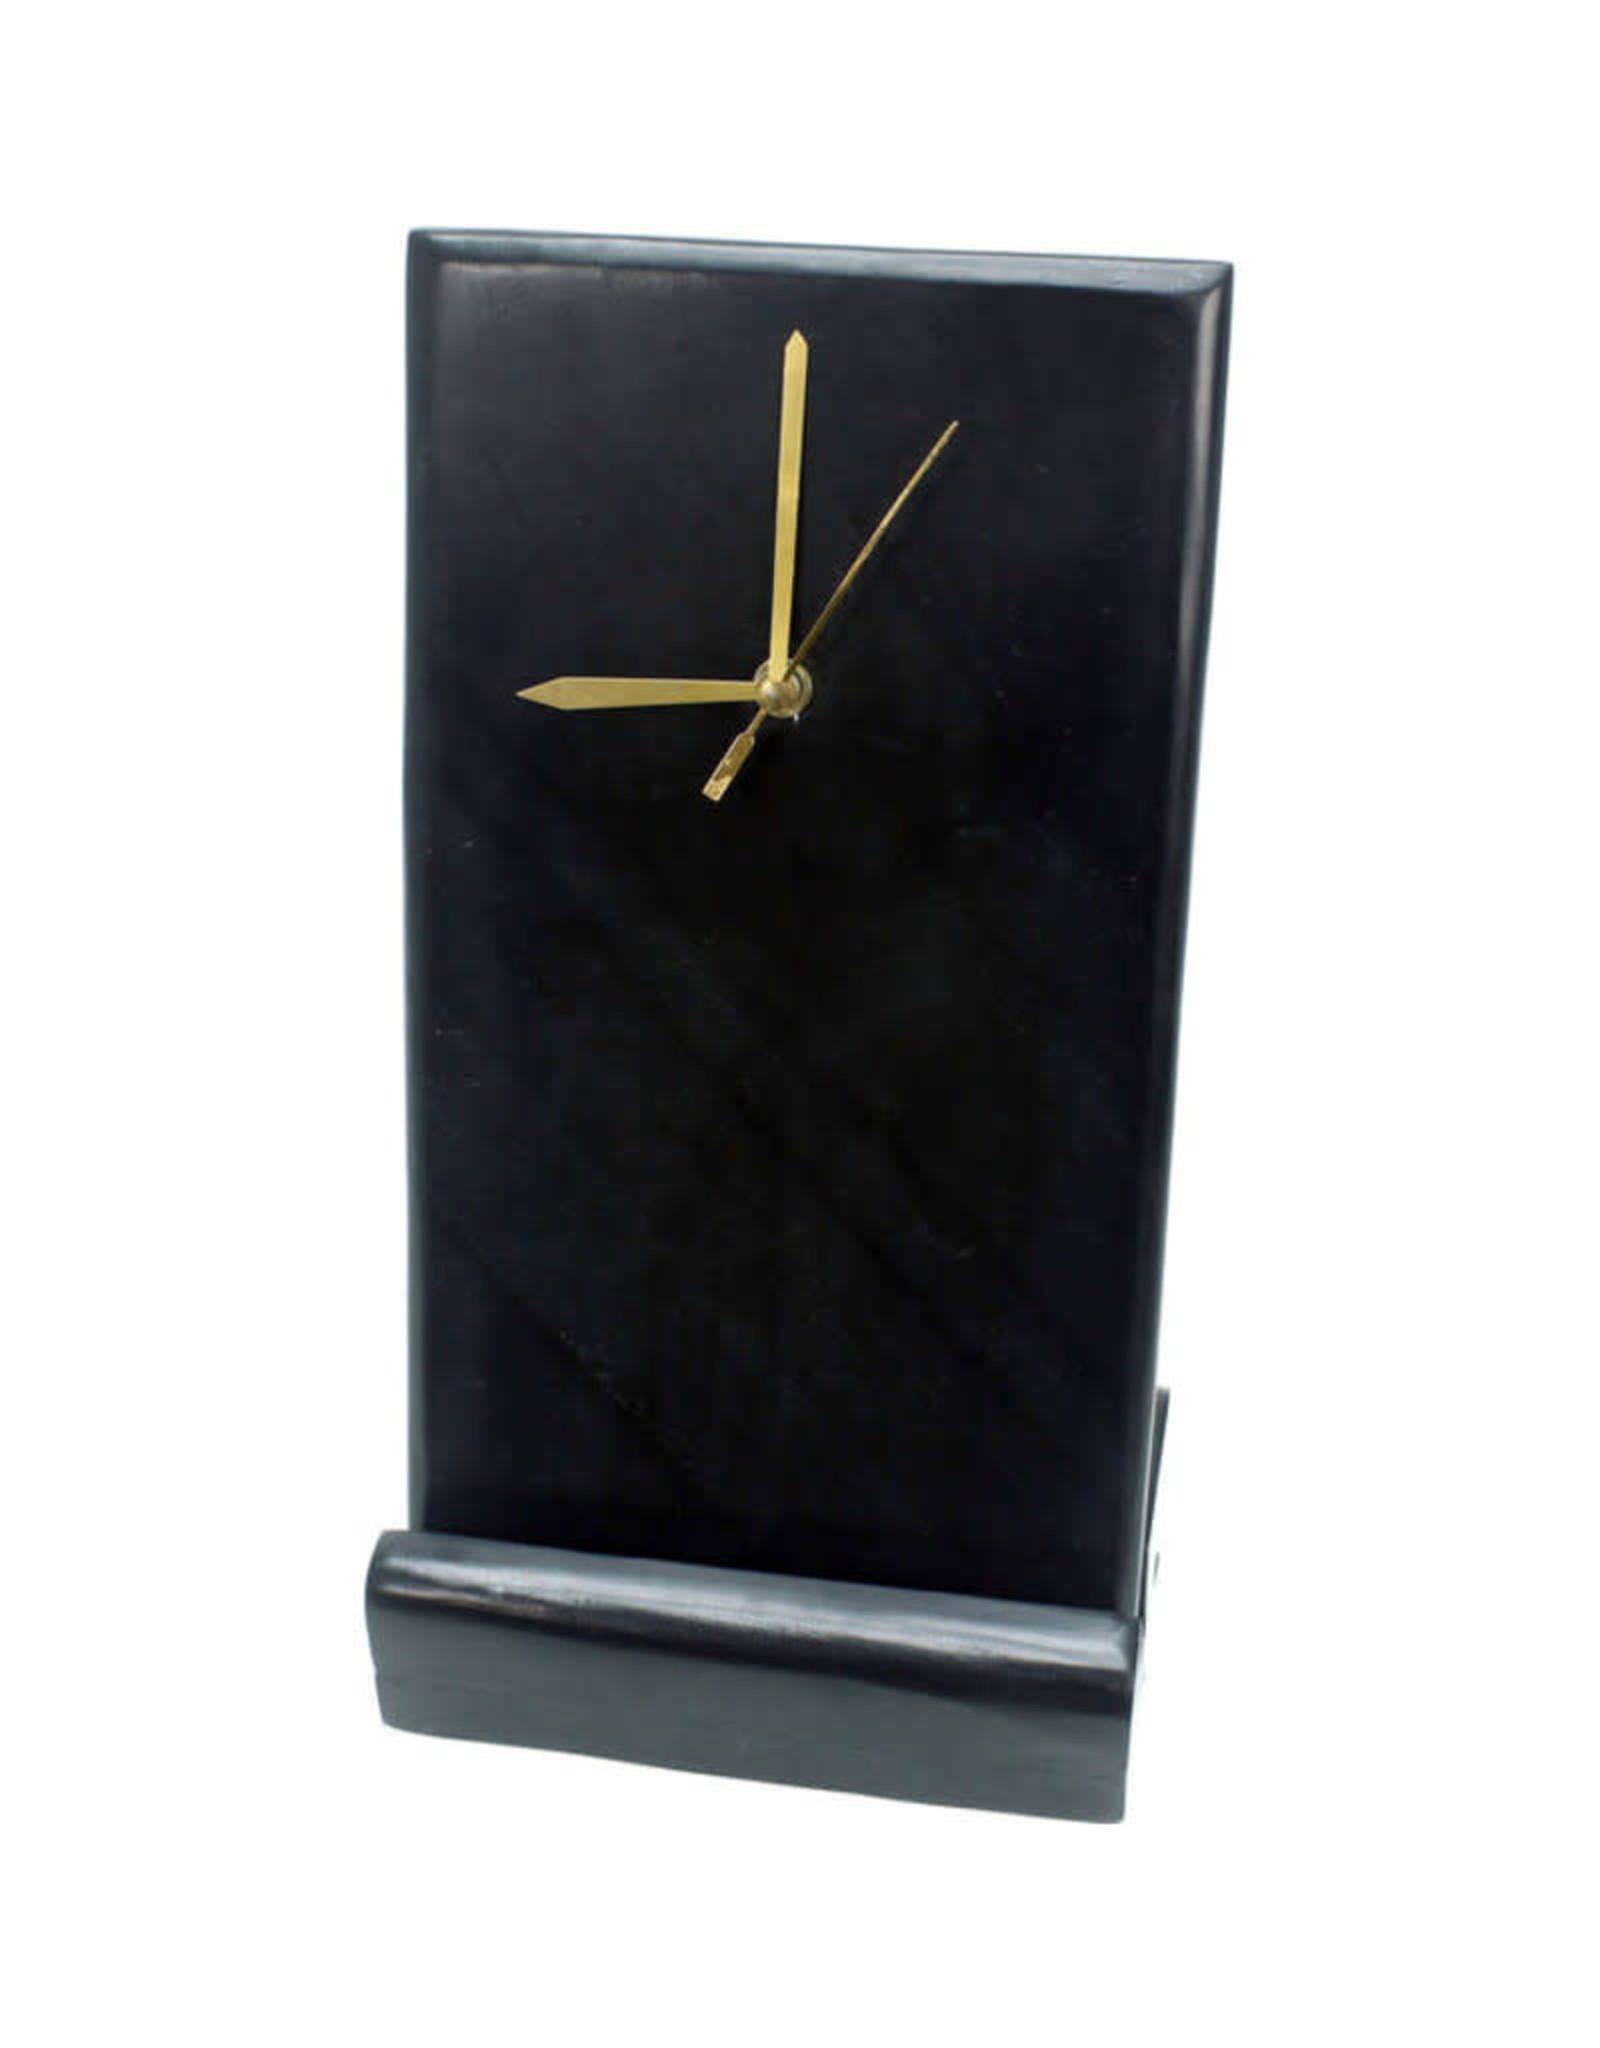 Tara Projects Erase Time Clock